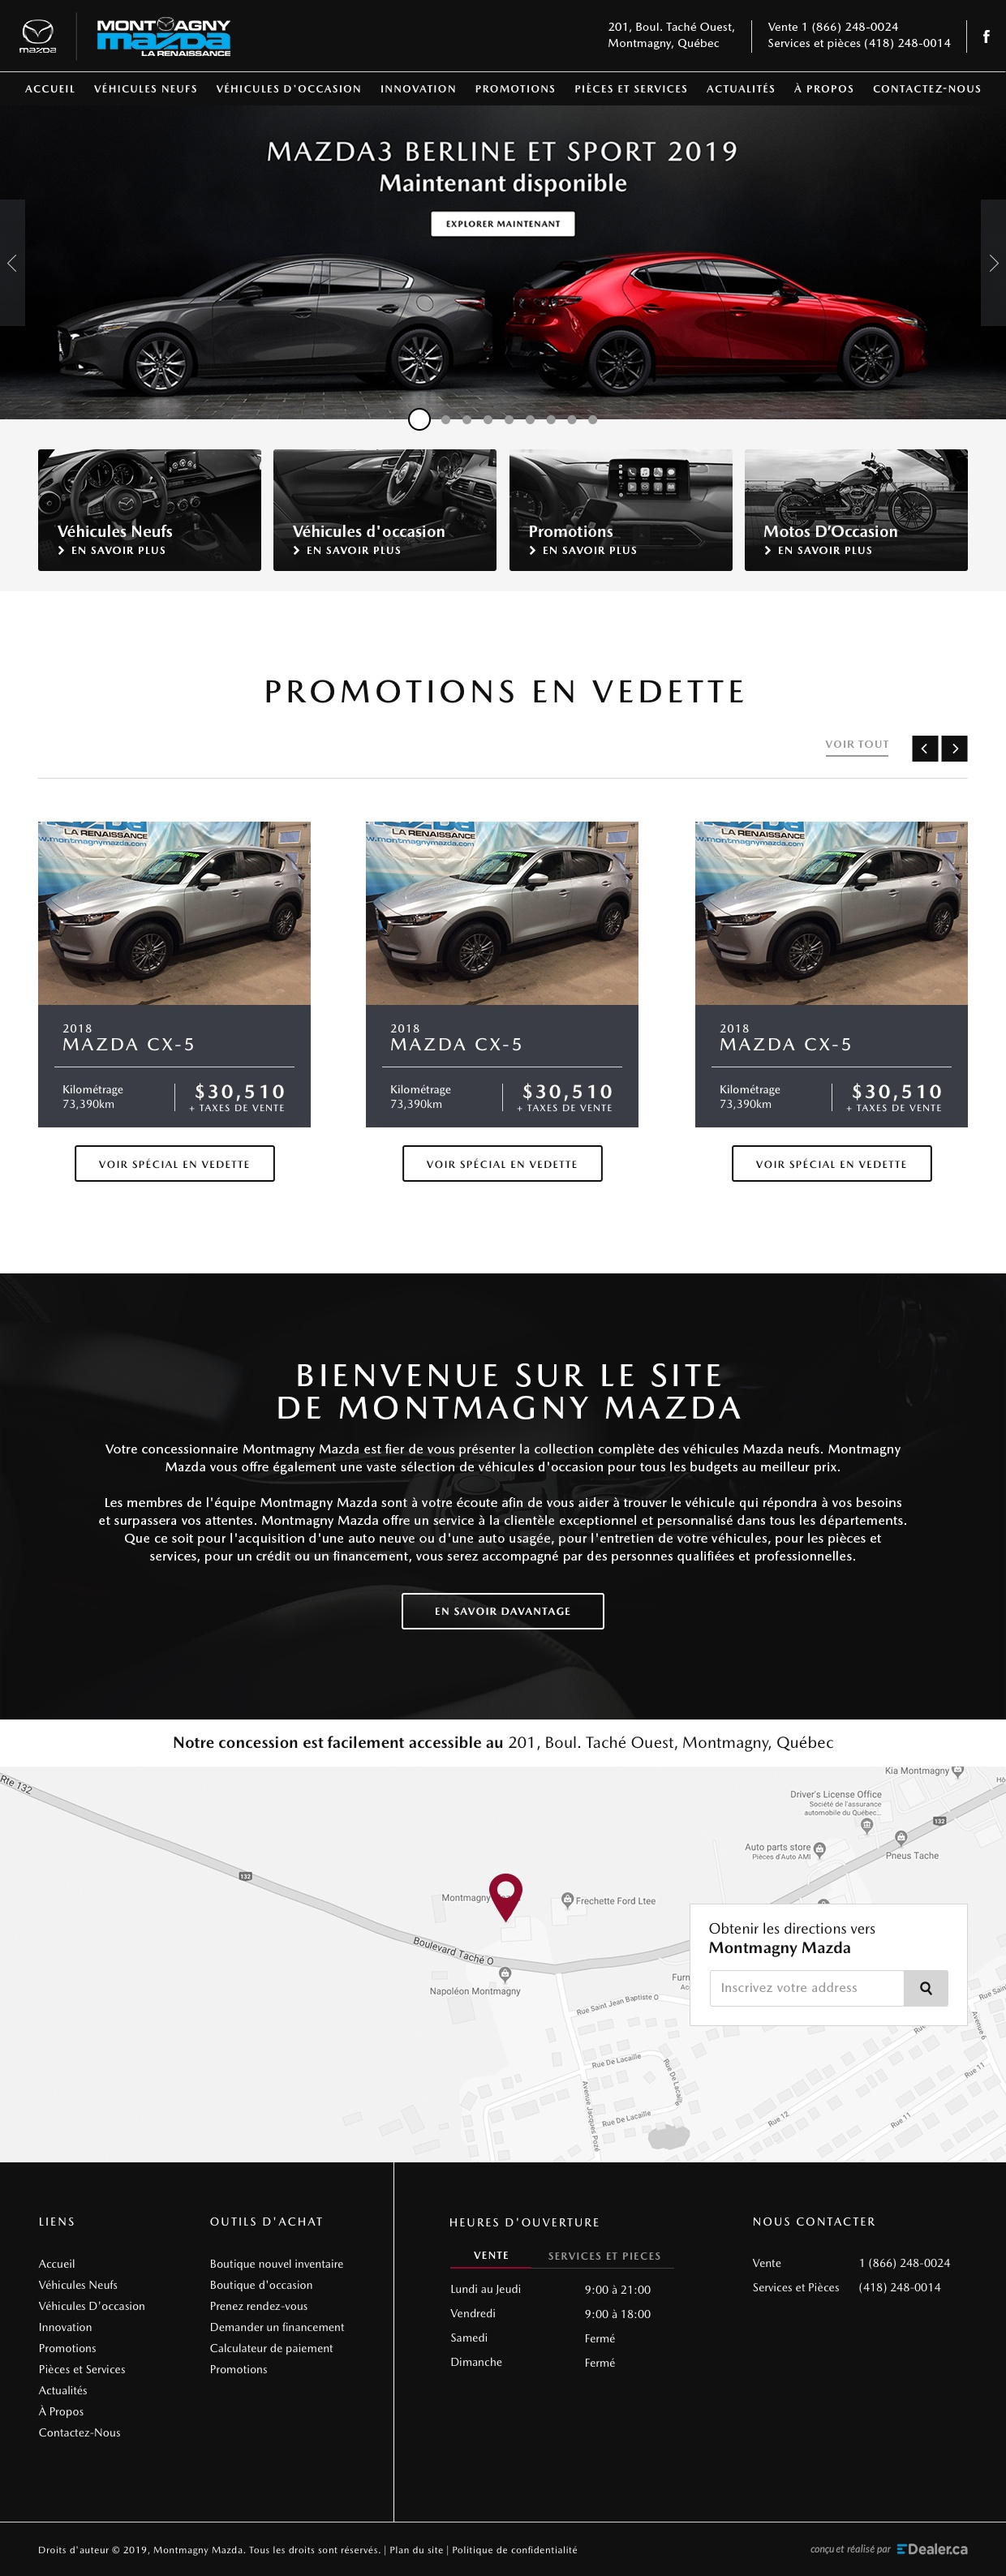 Montmagny Mazda